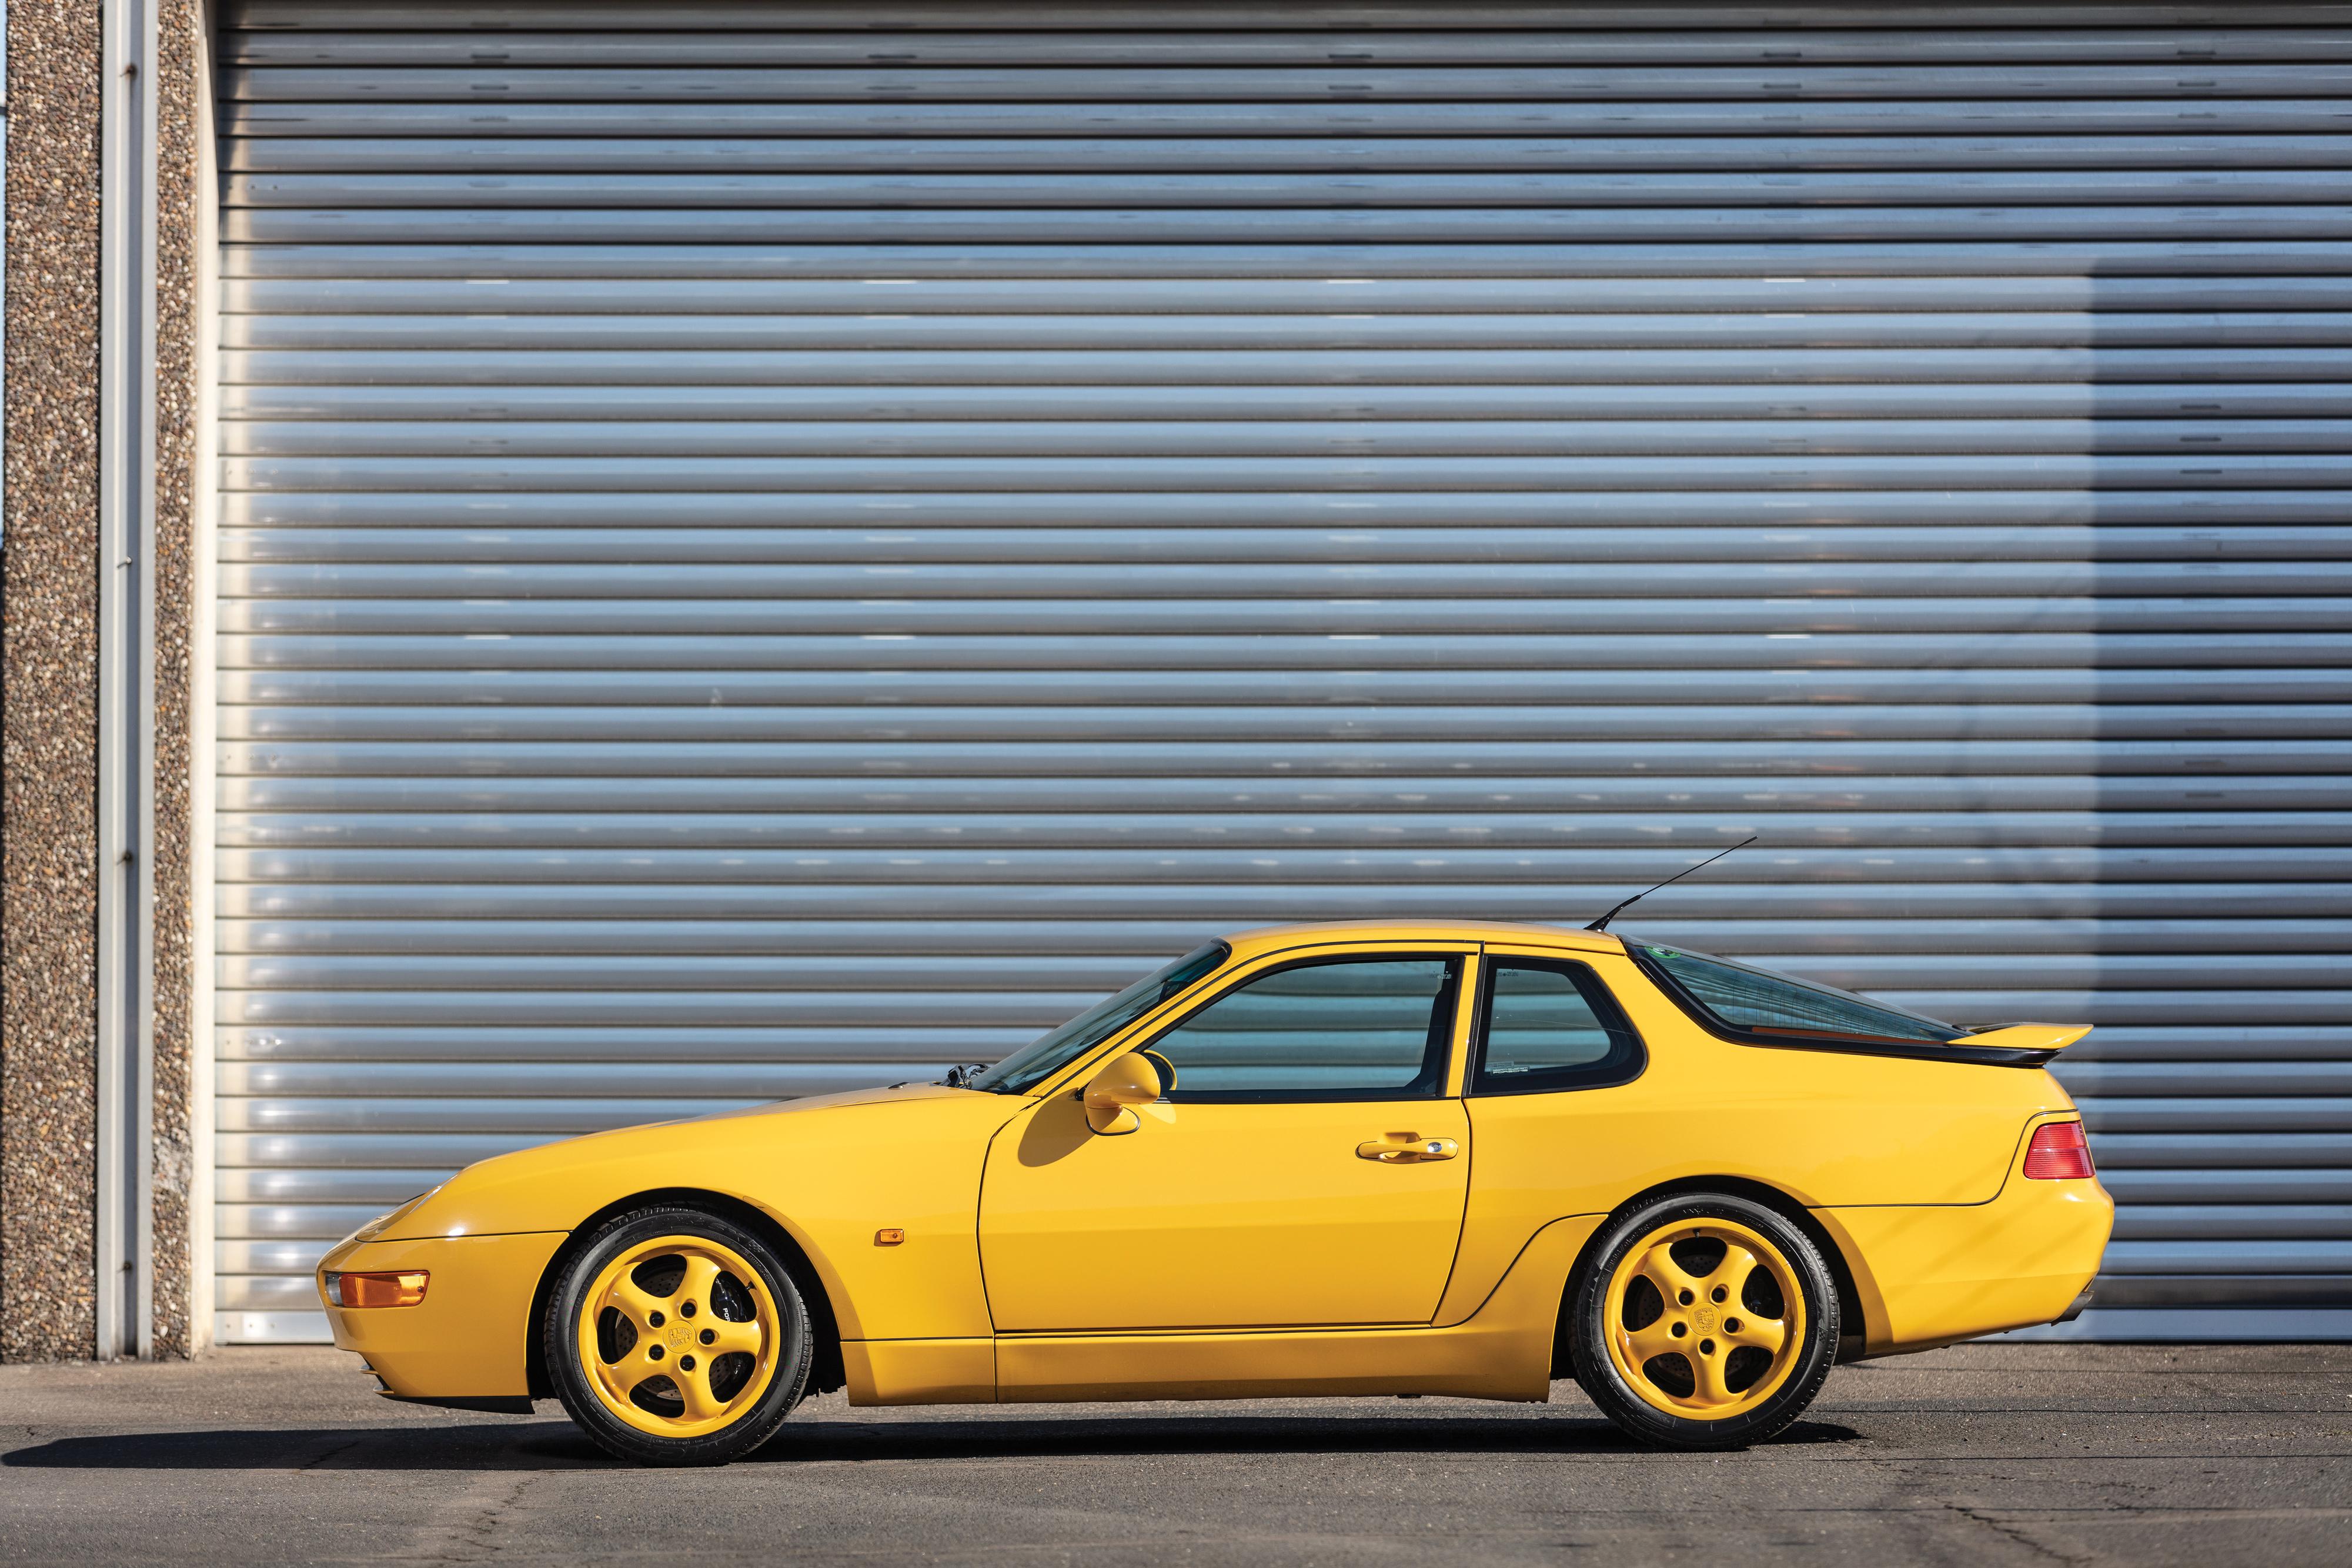 1994 Porsche 968 Clubsport - RM Sotheby's Essen Sale